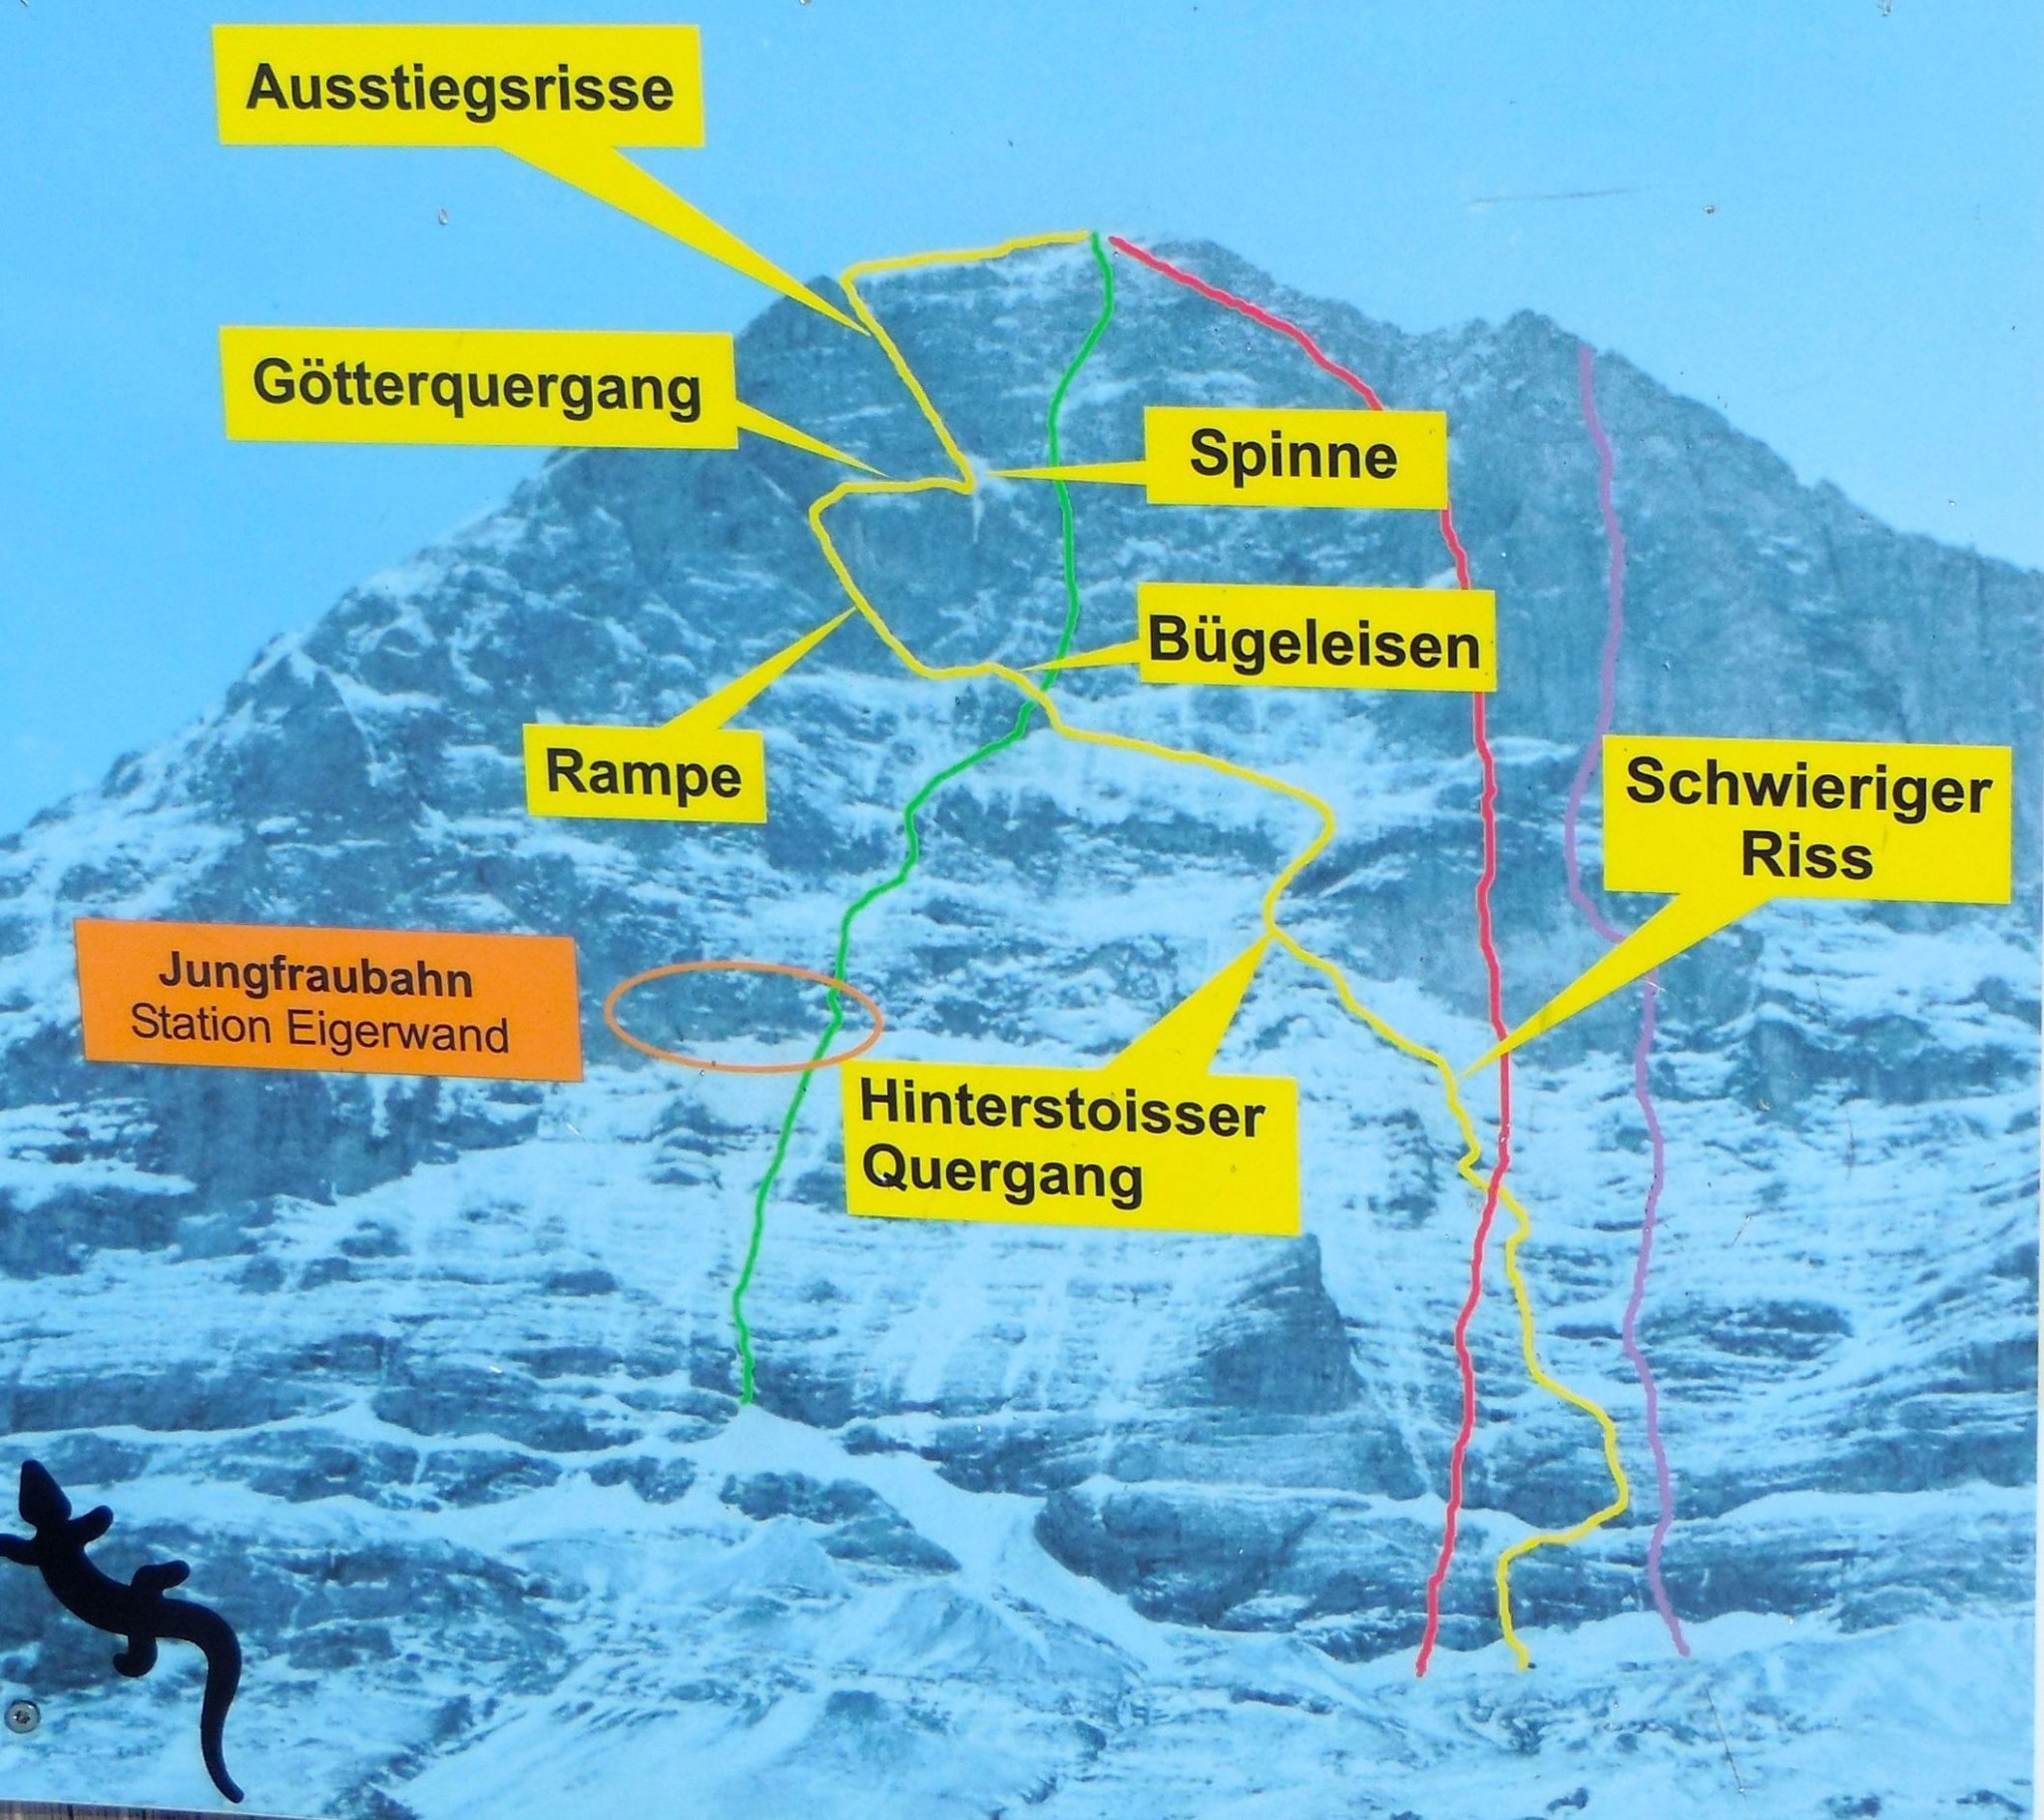 Winter Walking Paths in the Jungfrau Region of Switzerland Travels